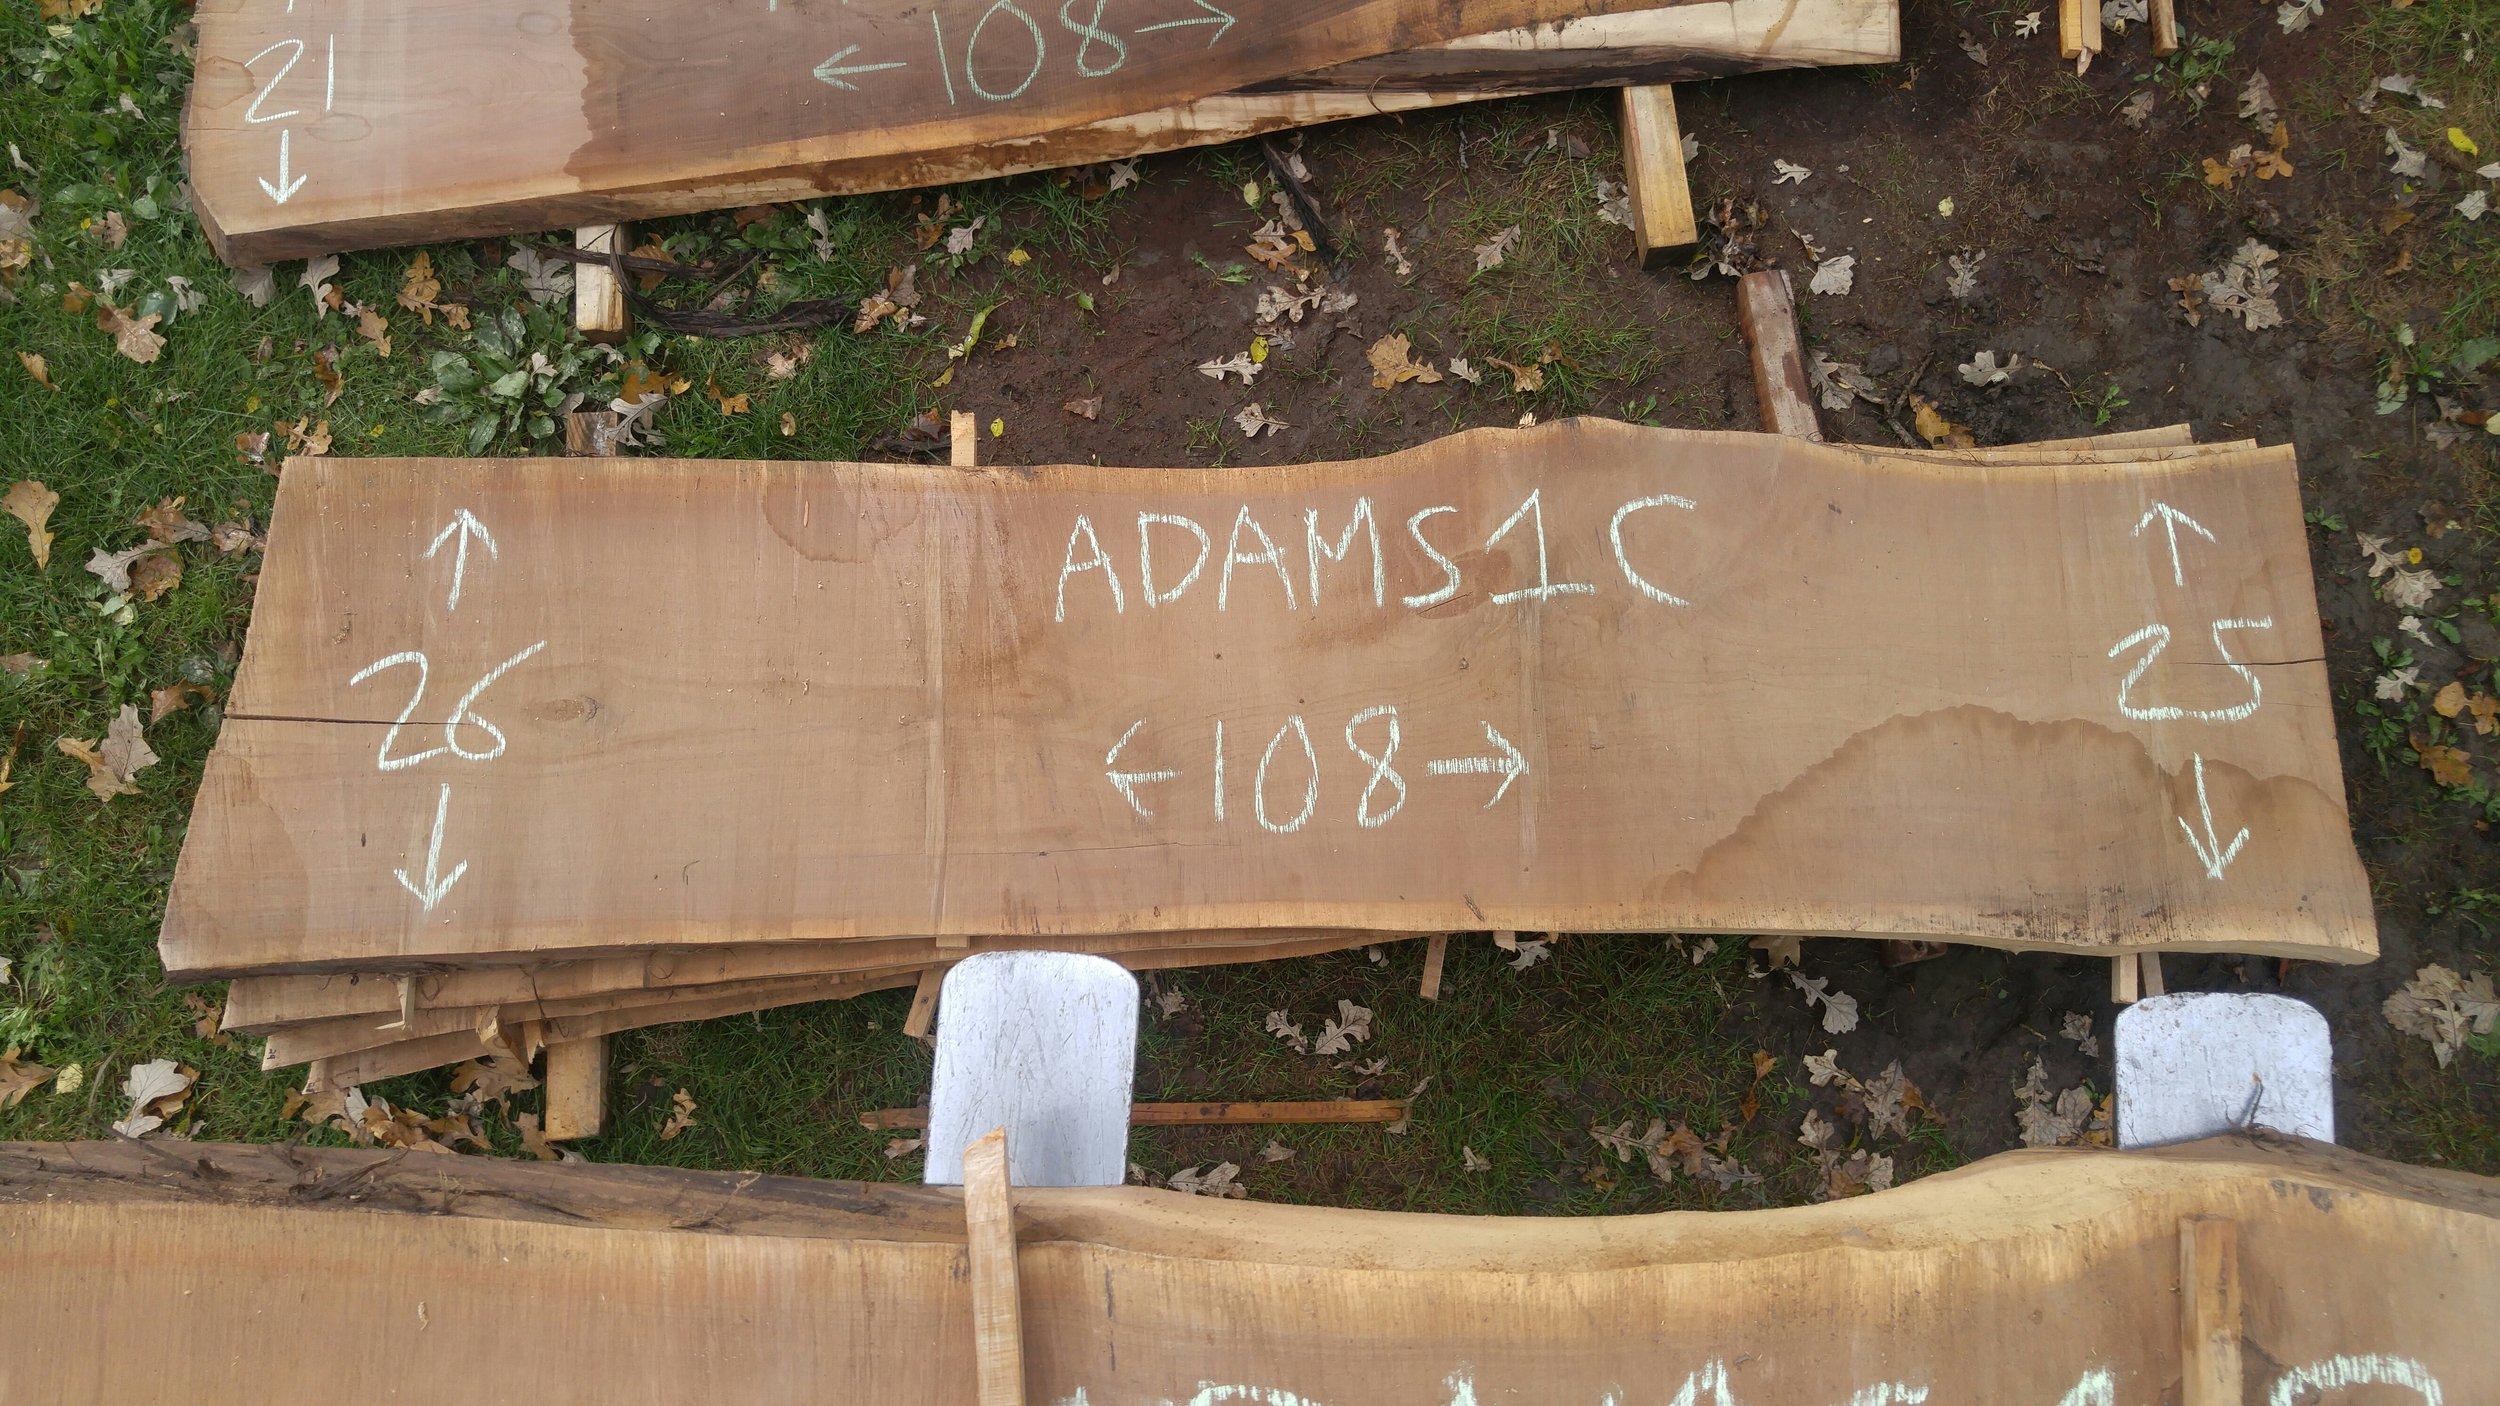 Adams1C.jpg